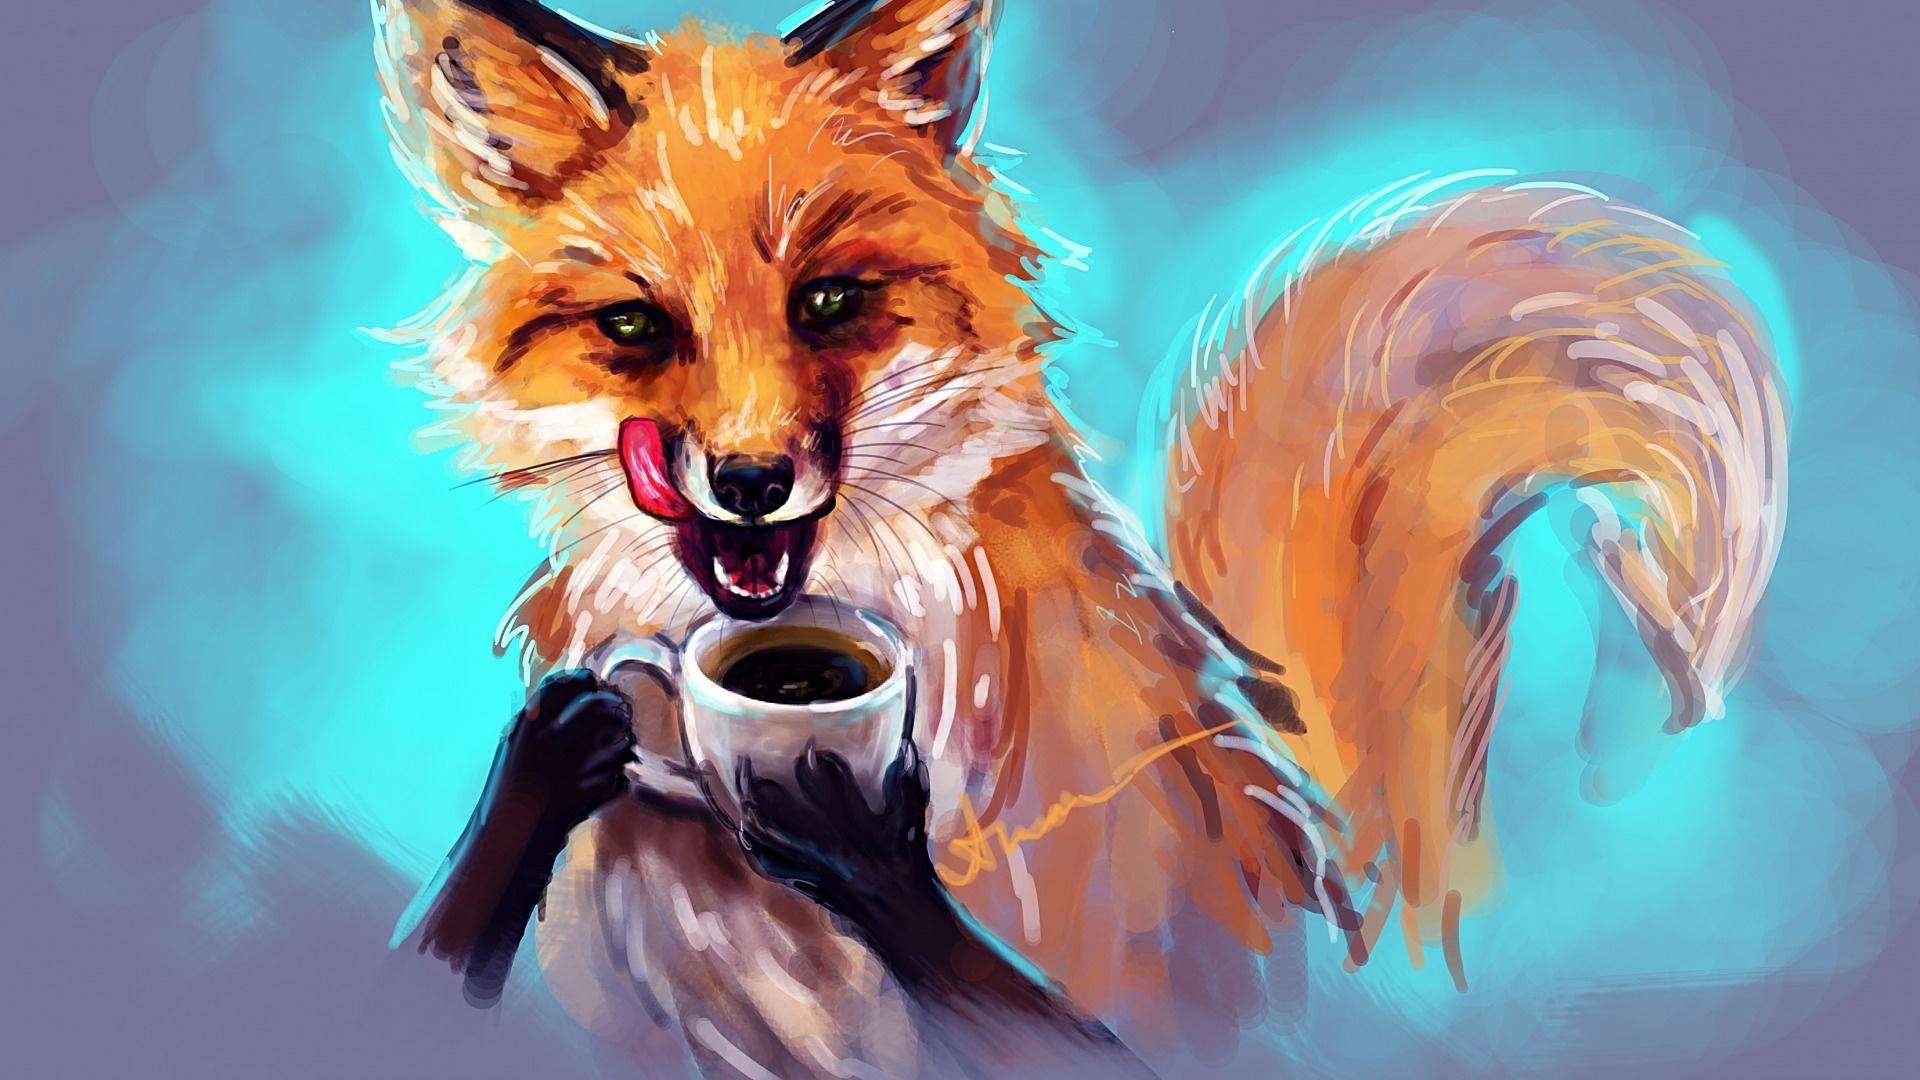 Fox Art Wallpaper